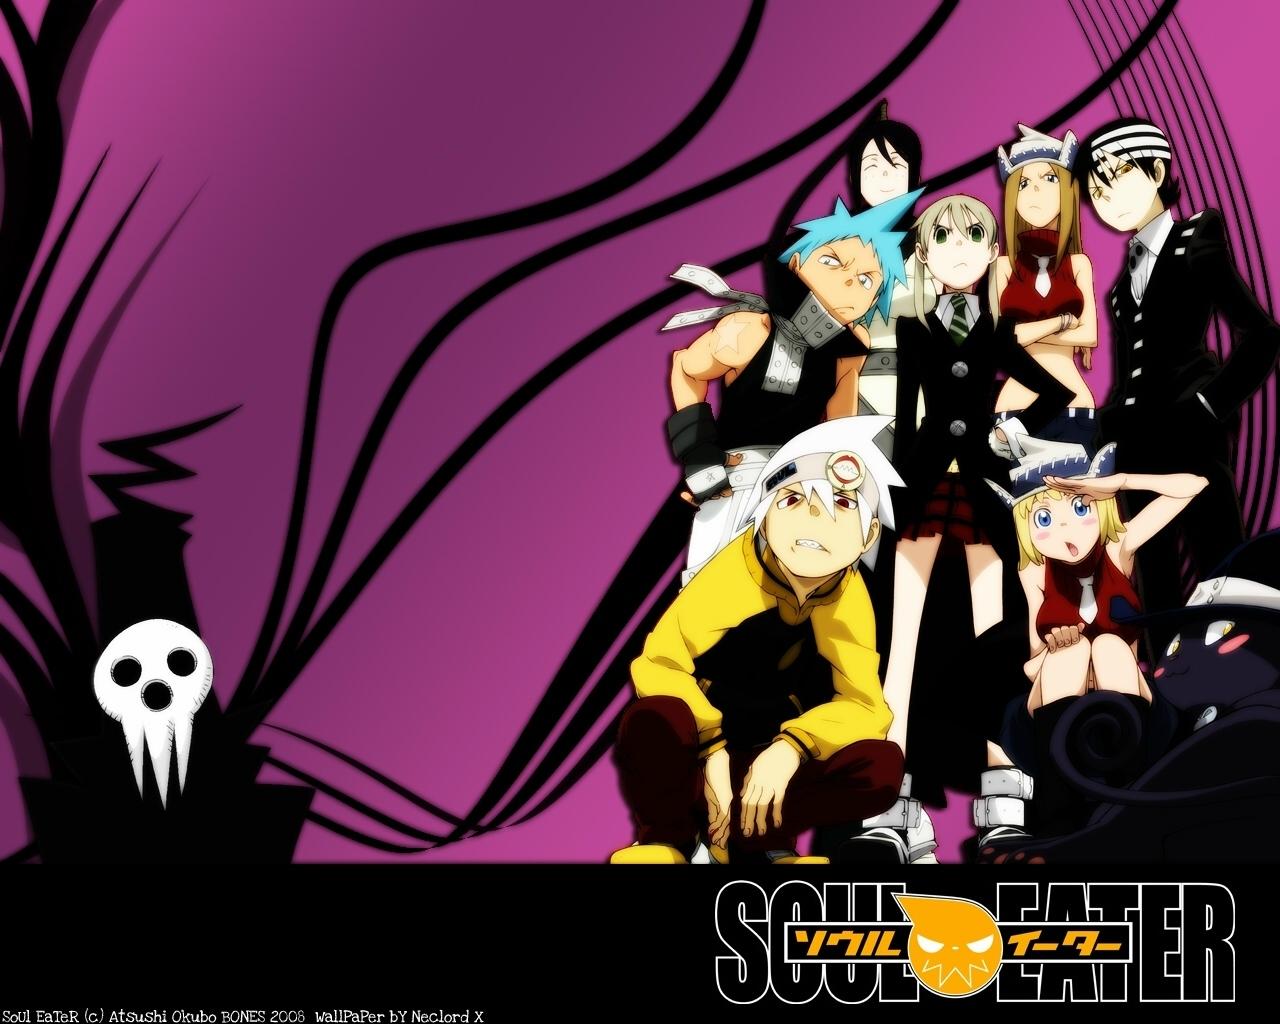 Anime Manga Wallpaper Soul Eater Fans Images Soul Eater 3 Hd Wallpaper And